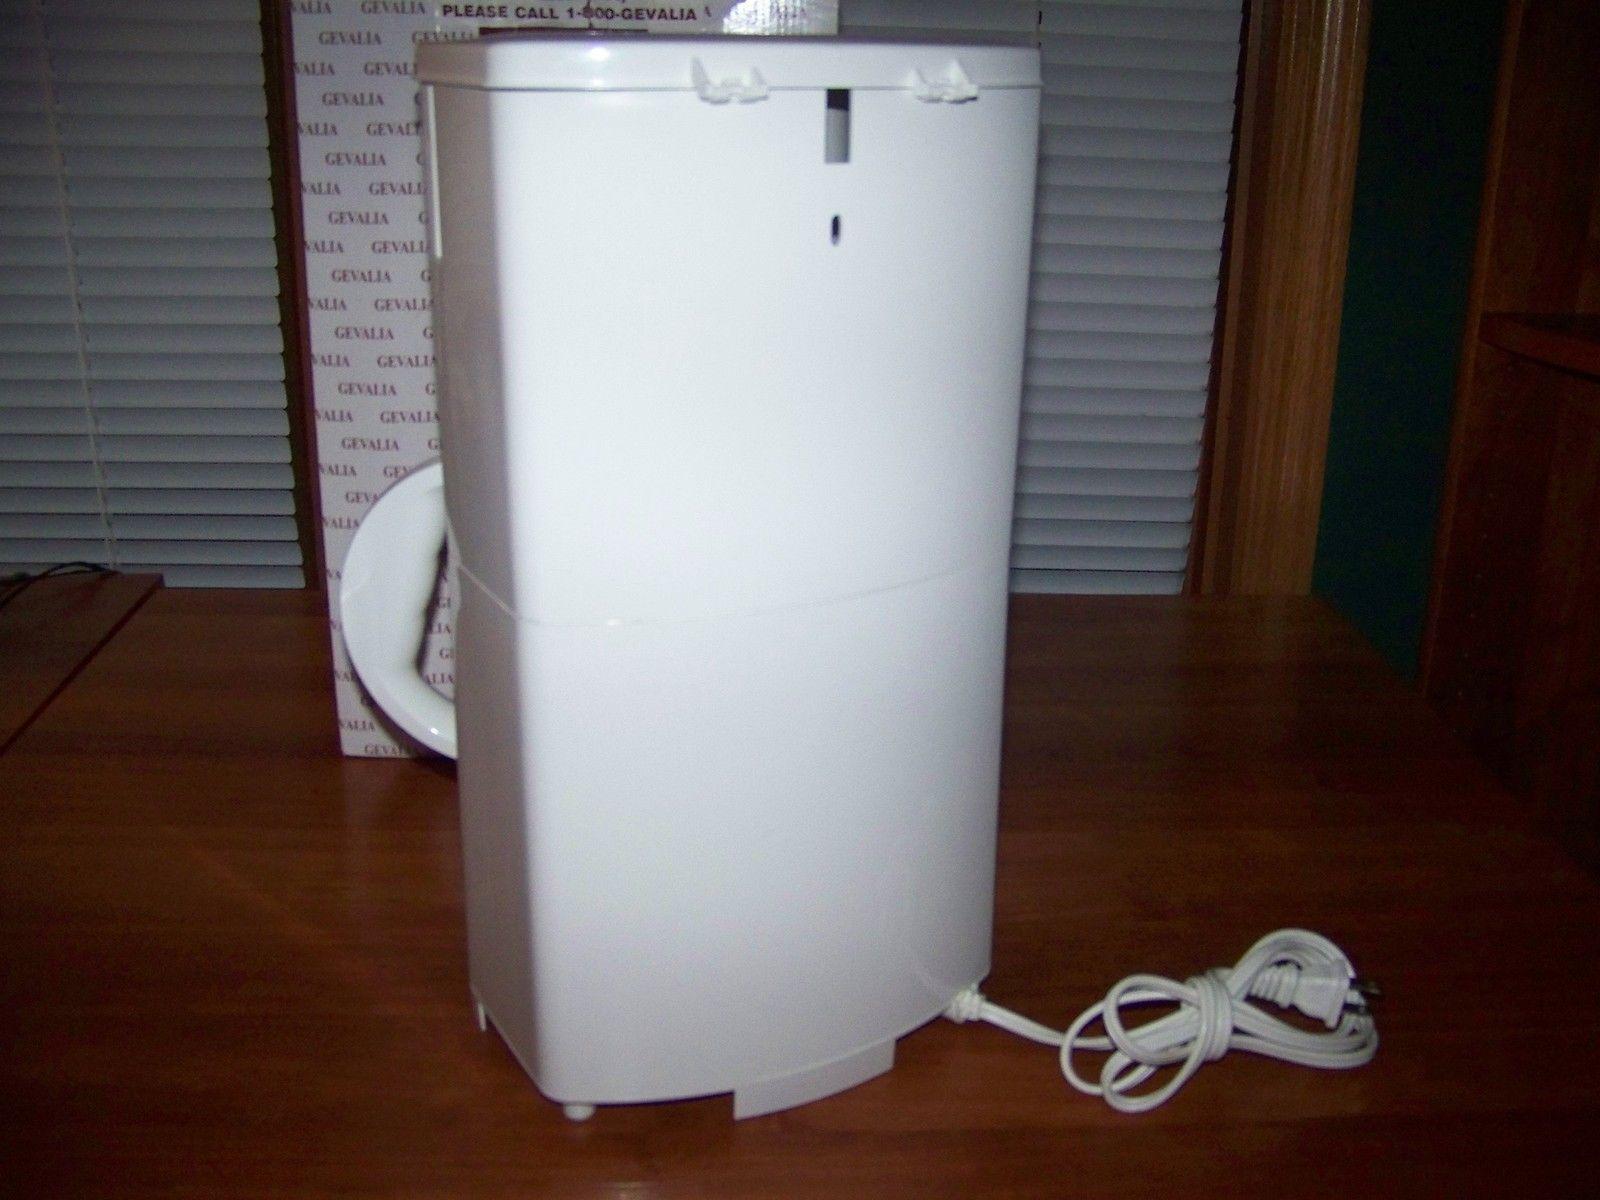 Gevalia Coffee Maker Ka 865mw : 8 Cup GEVALIA Thermal Carafe Automatic Coffee Maker Model KA-865MW White in Box - Coffee Makers ...